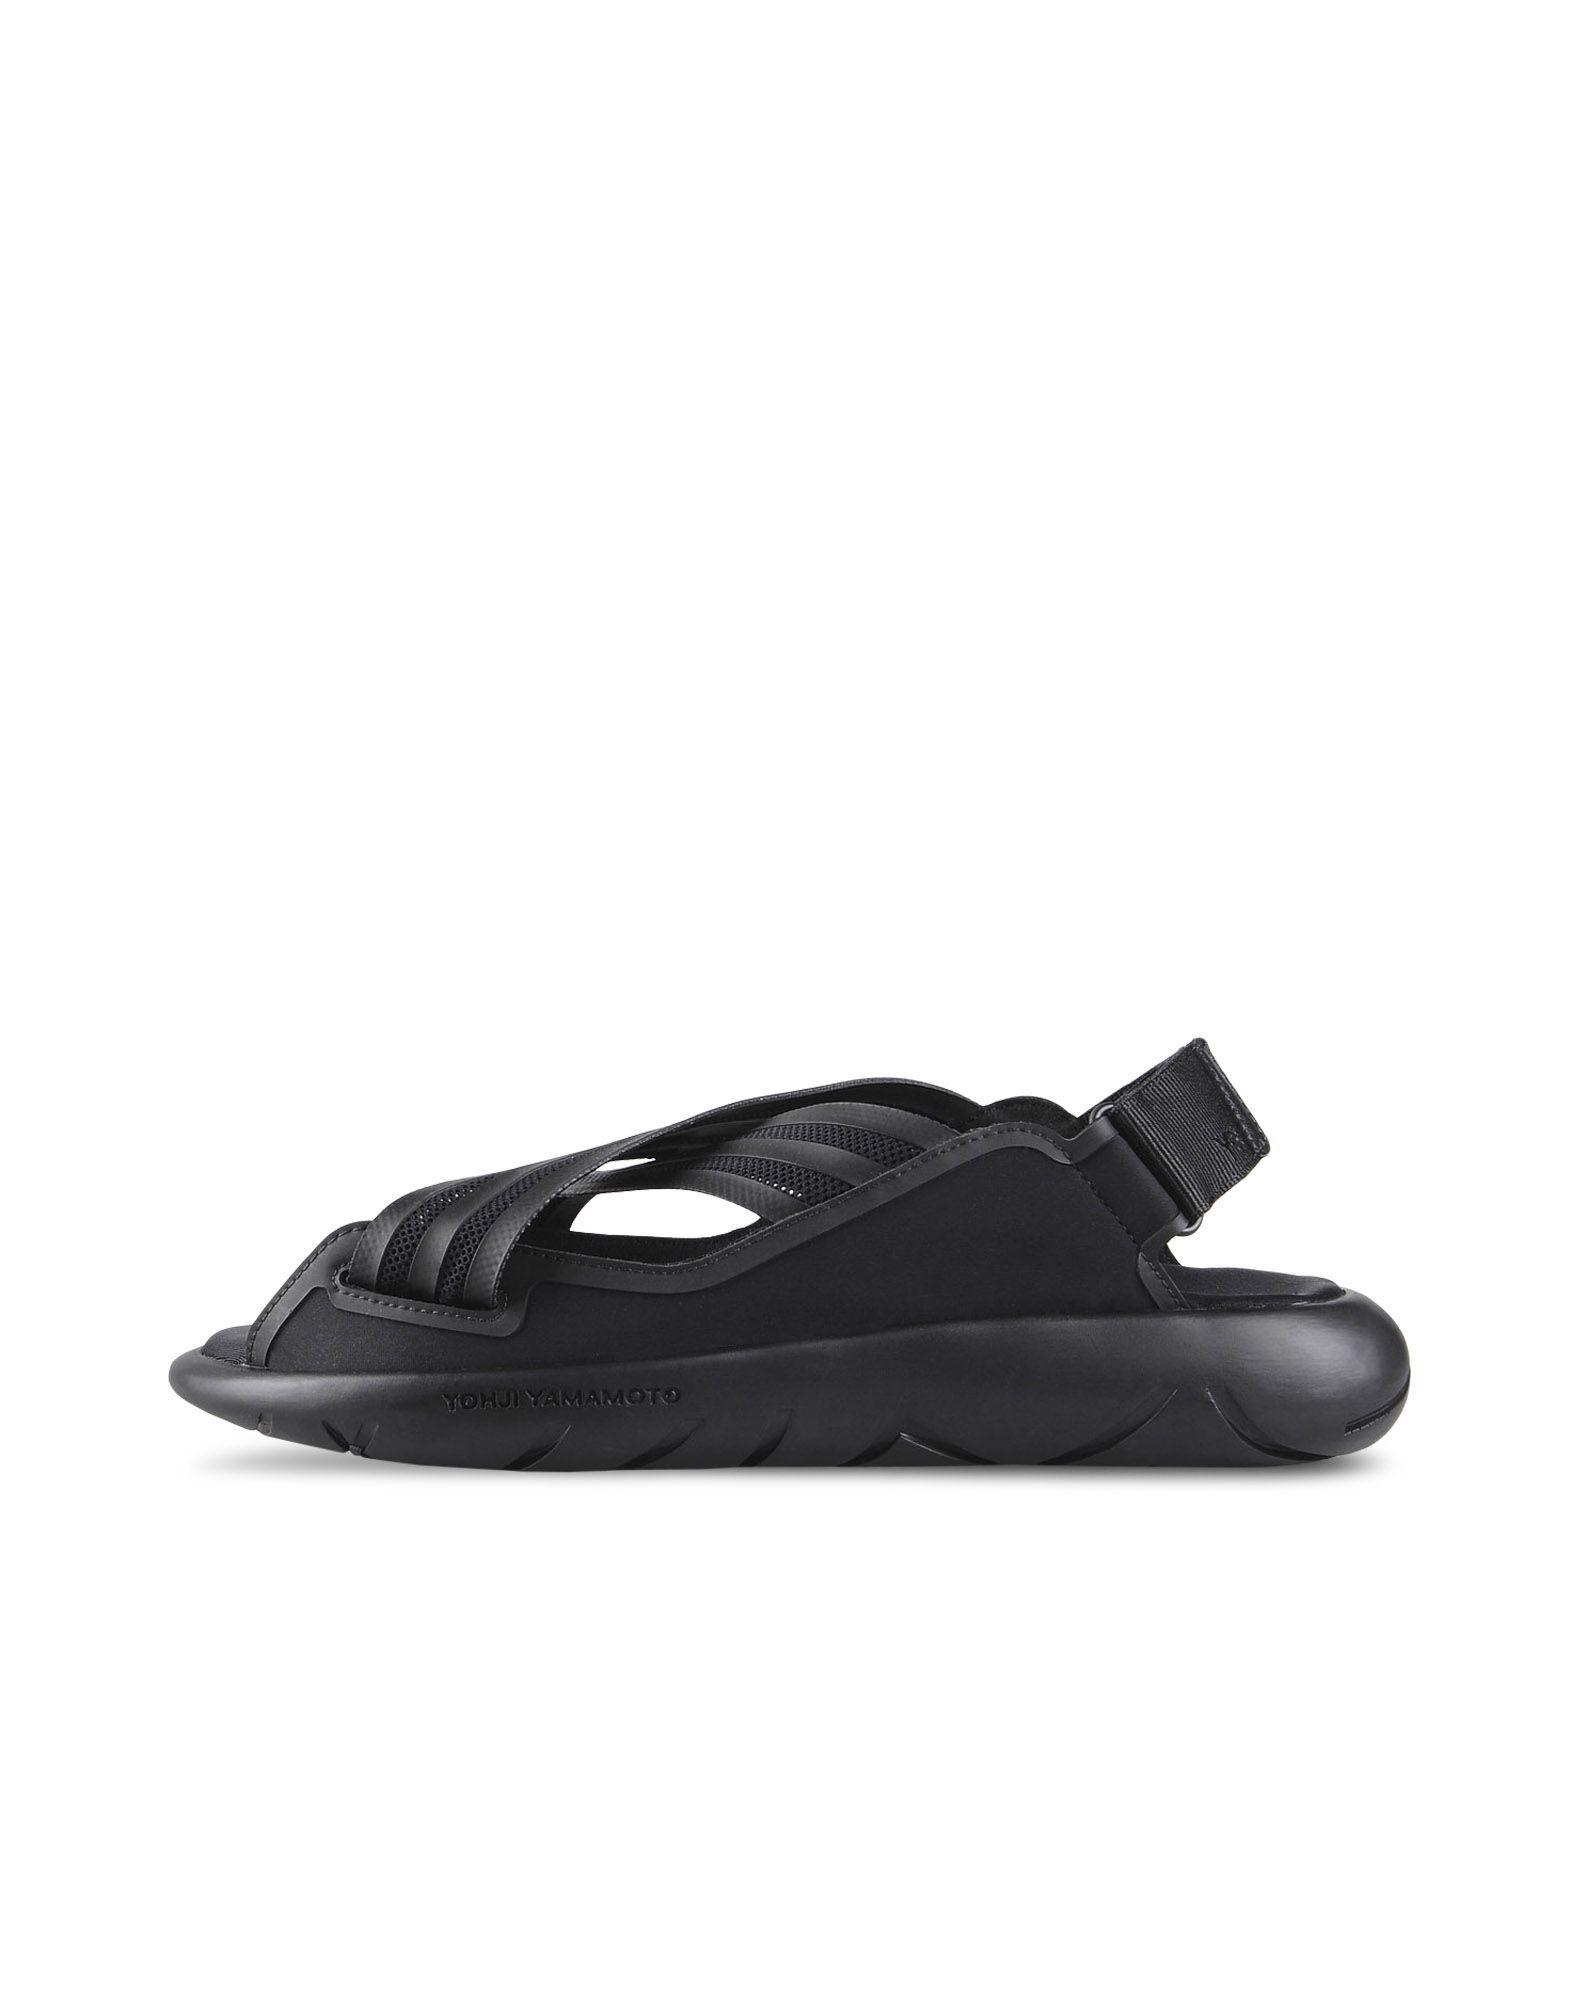 Women's sandals good for plantar fasciitis uk - Y 3 Qasa Elle Sandal Shoes Woman Y 3 Adidas Plantar Fasciitisshoes Women Adidas